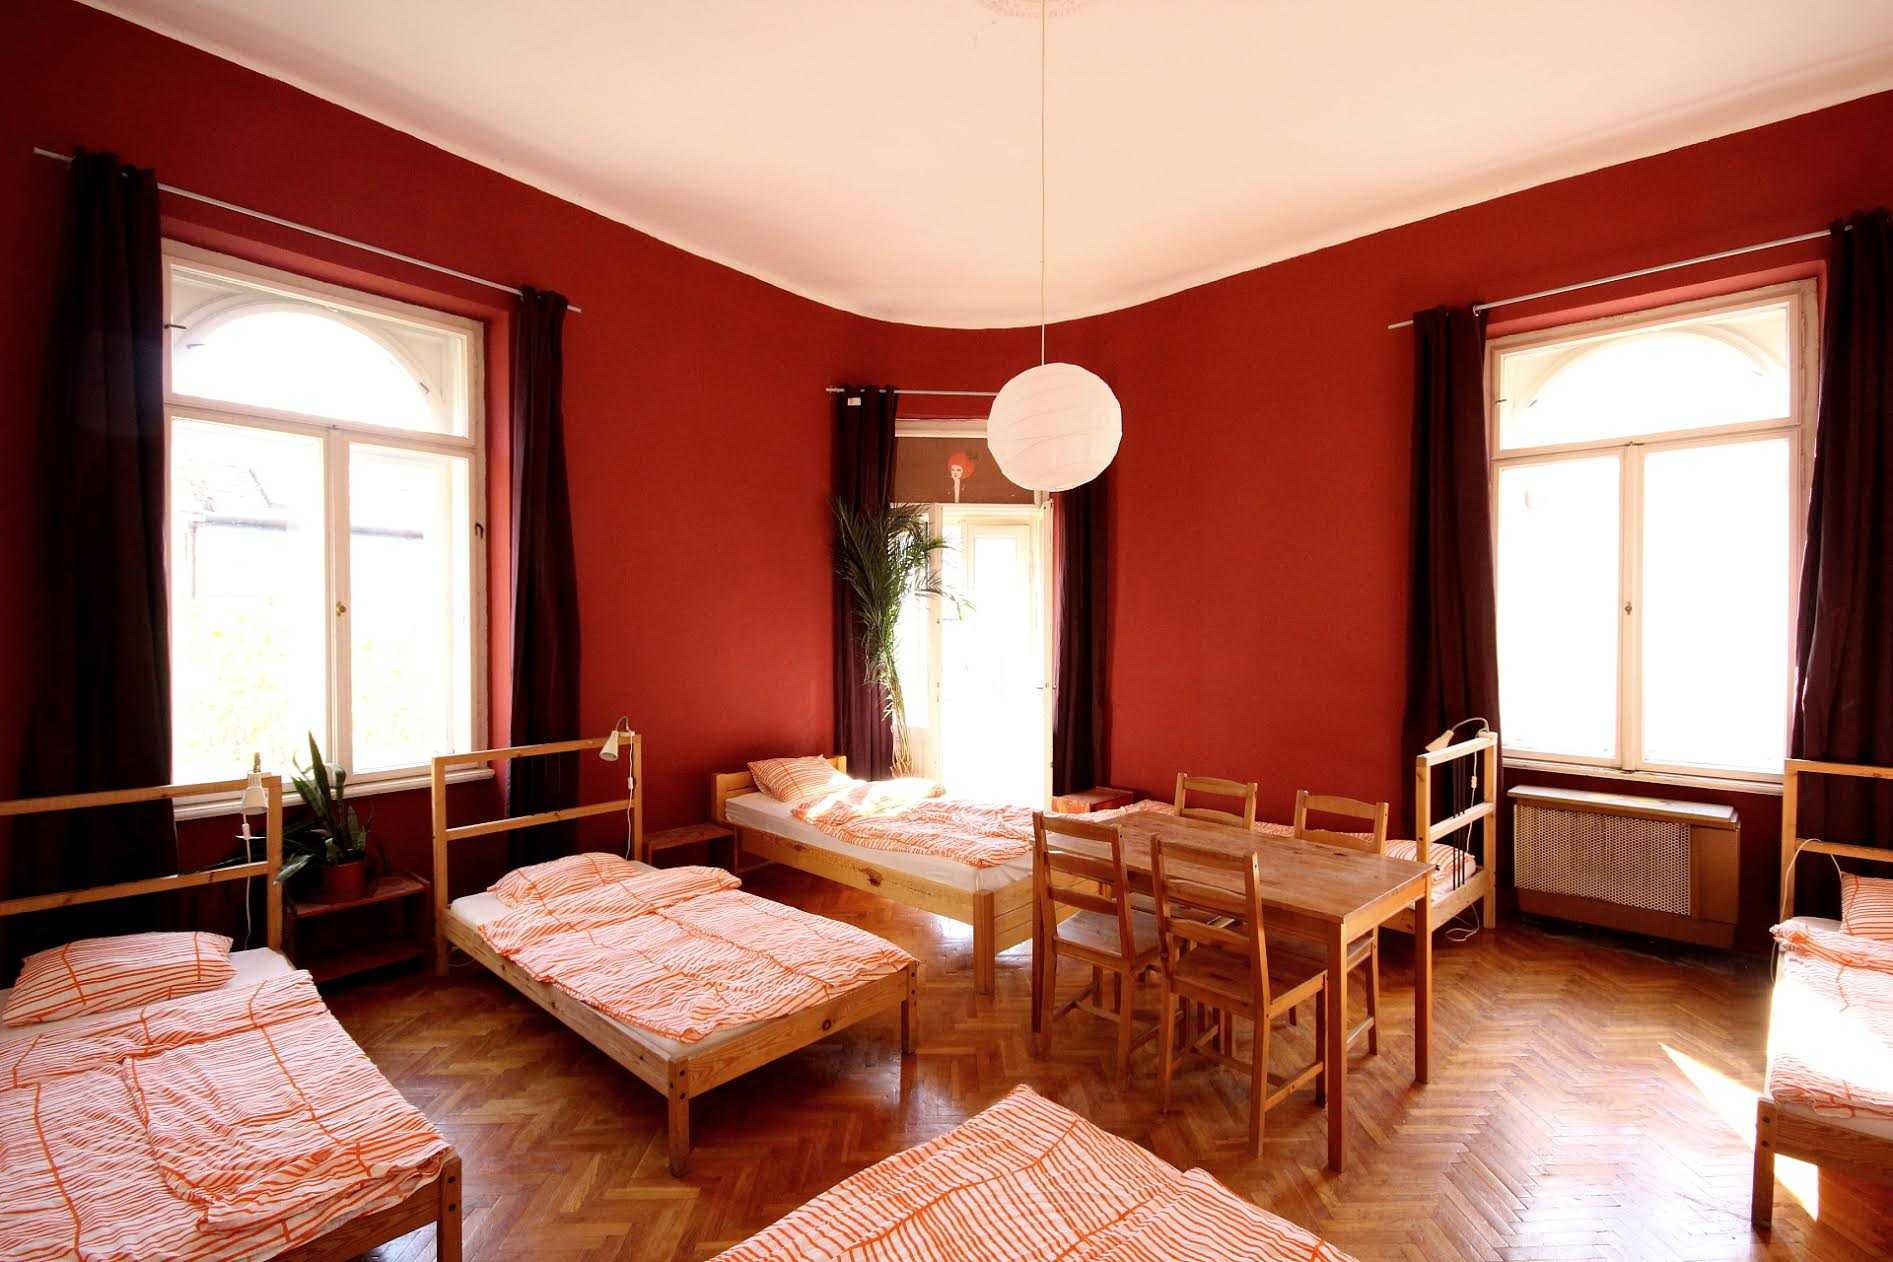 erkélyes szoba/ room with balcony